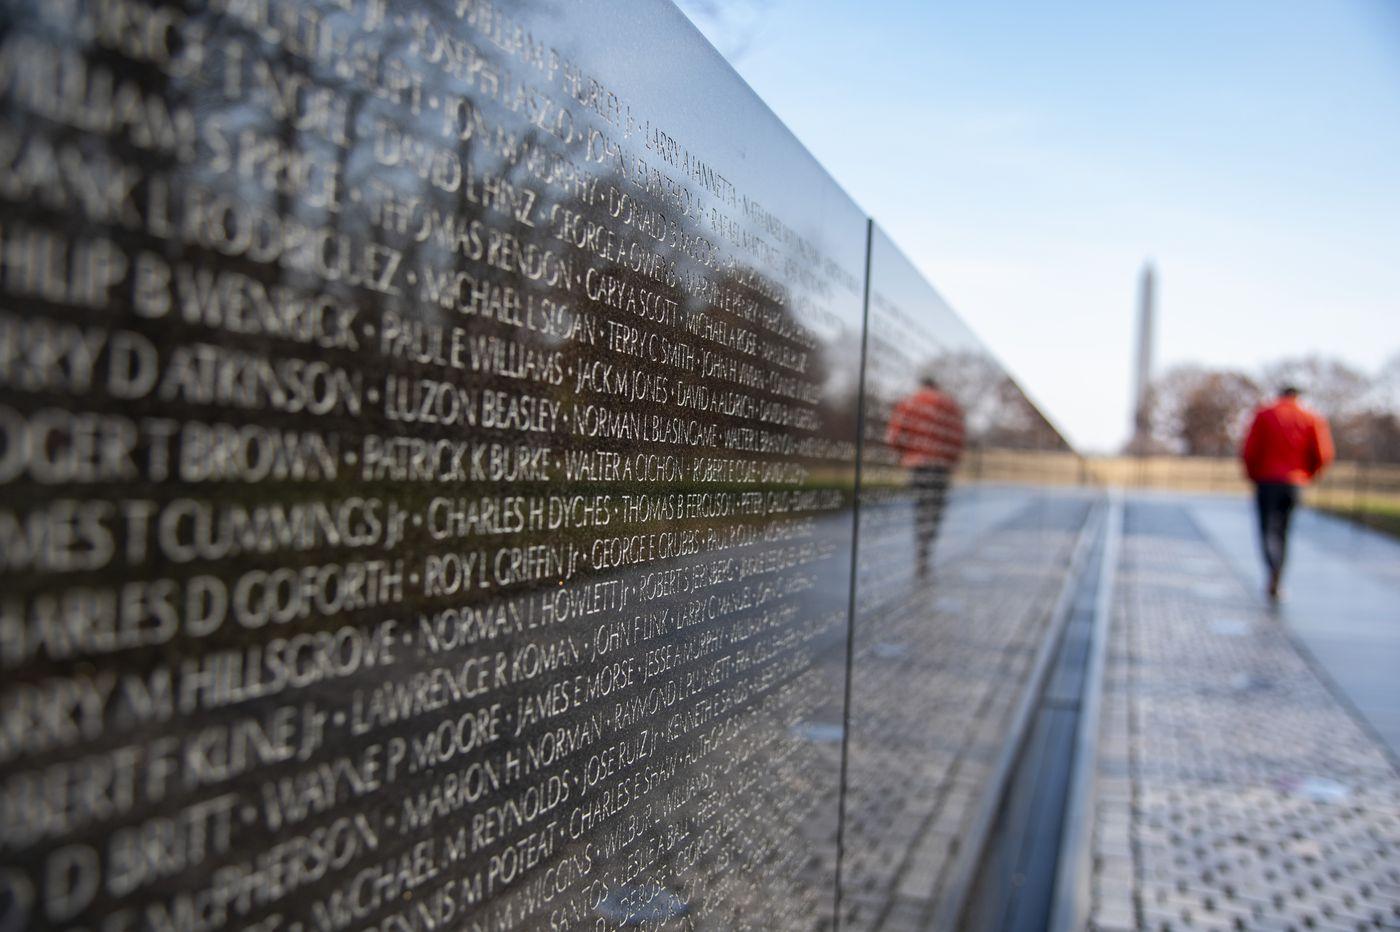 Audit finds misspellings, duplicates on Vietnam Wall